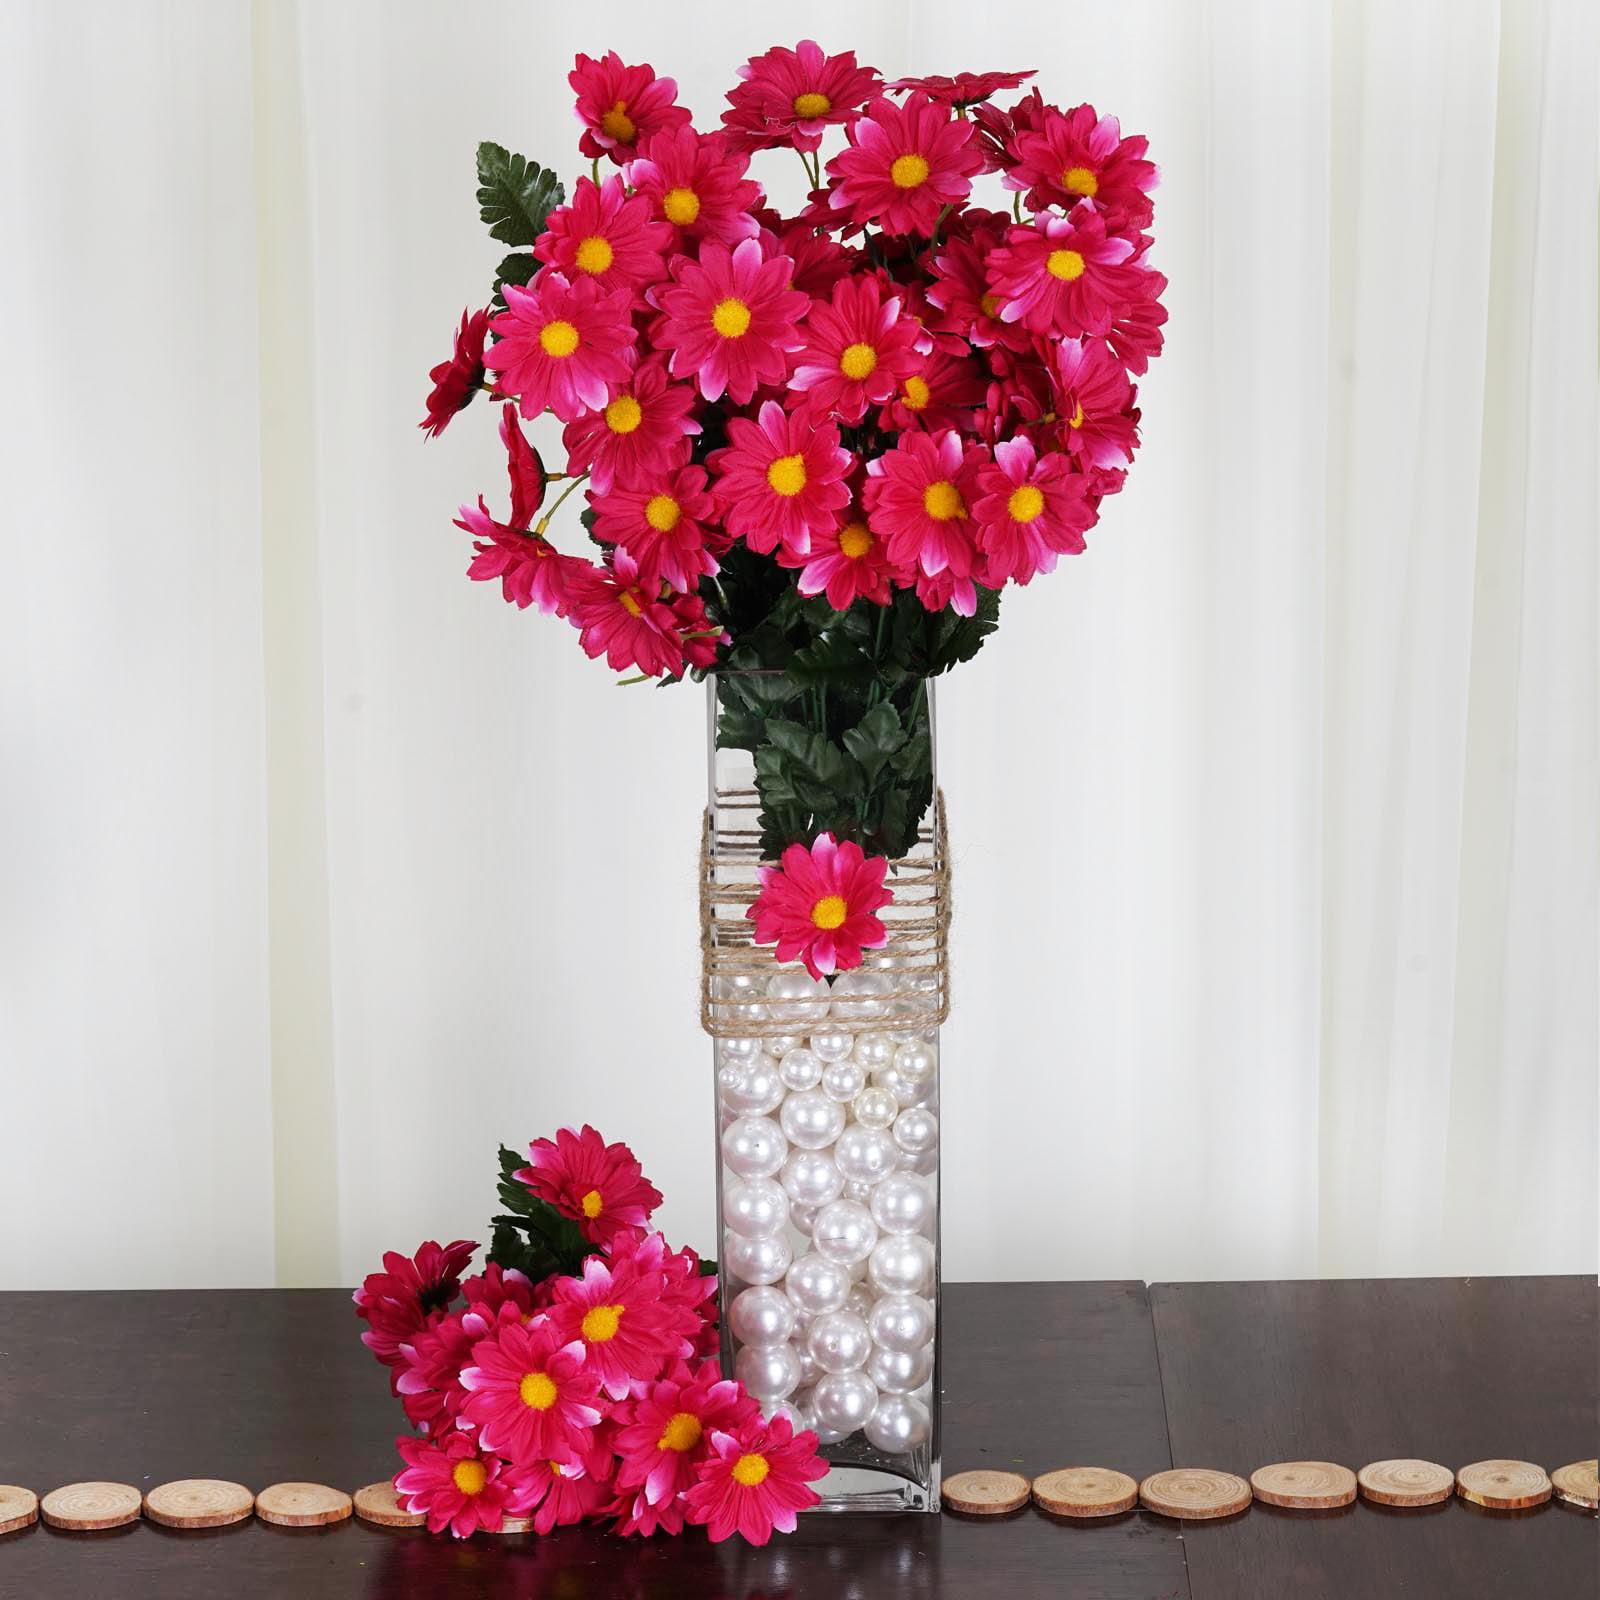 BalsaCircle 88 Silk Gerbera Daisy Flowers - DIY Daisies Home Wedding Party Artificial Bouquets Arrangements Centerpieces